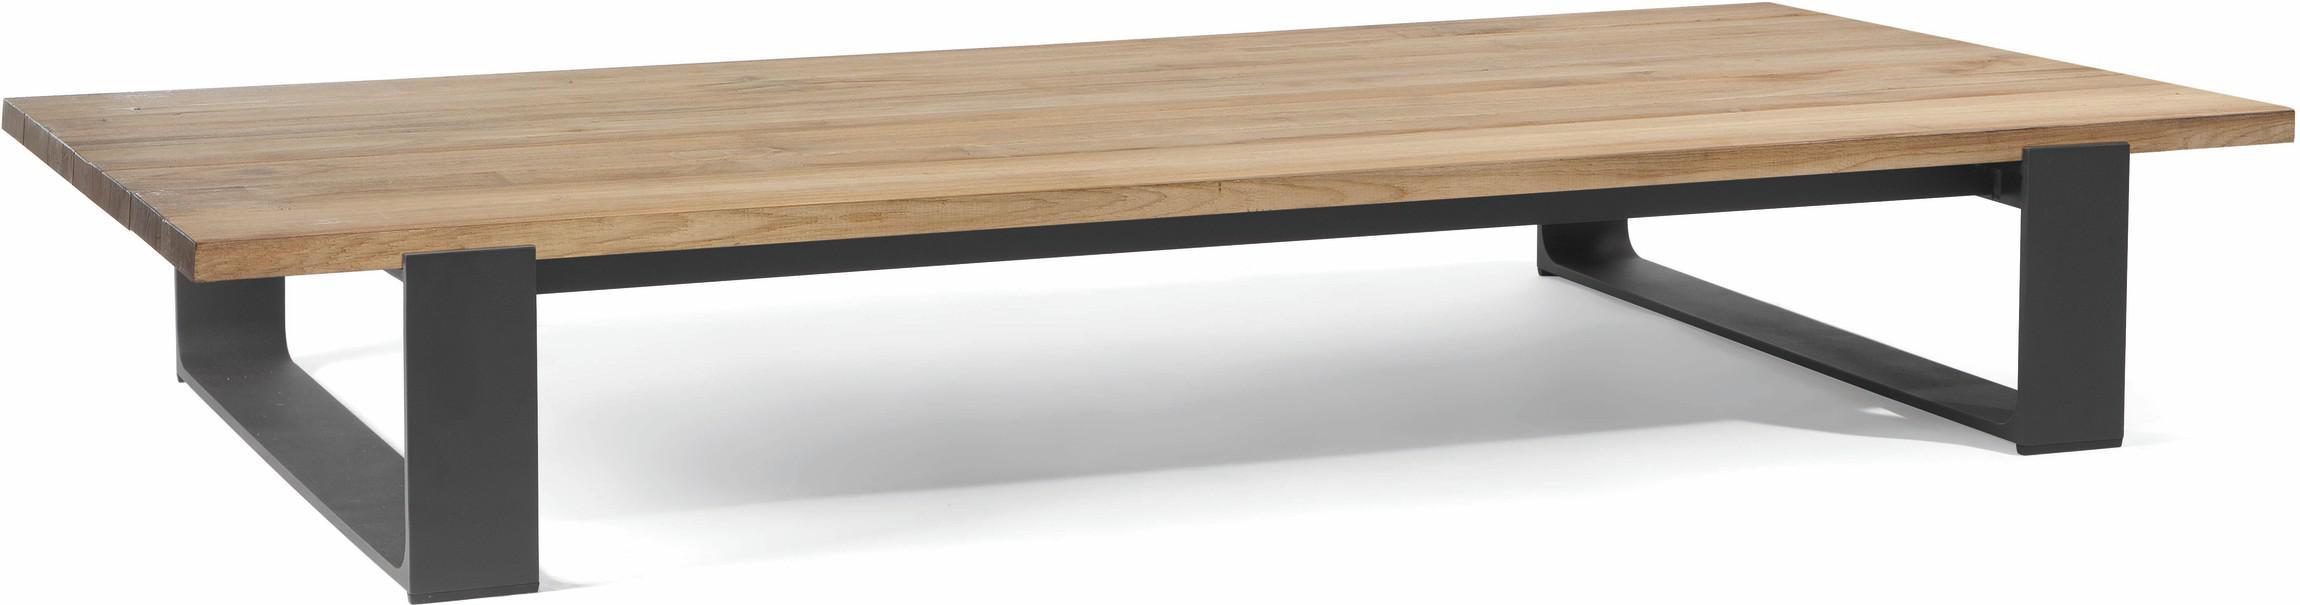 Prato coffee table - lava - Teak 180